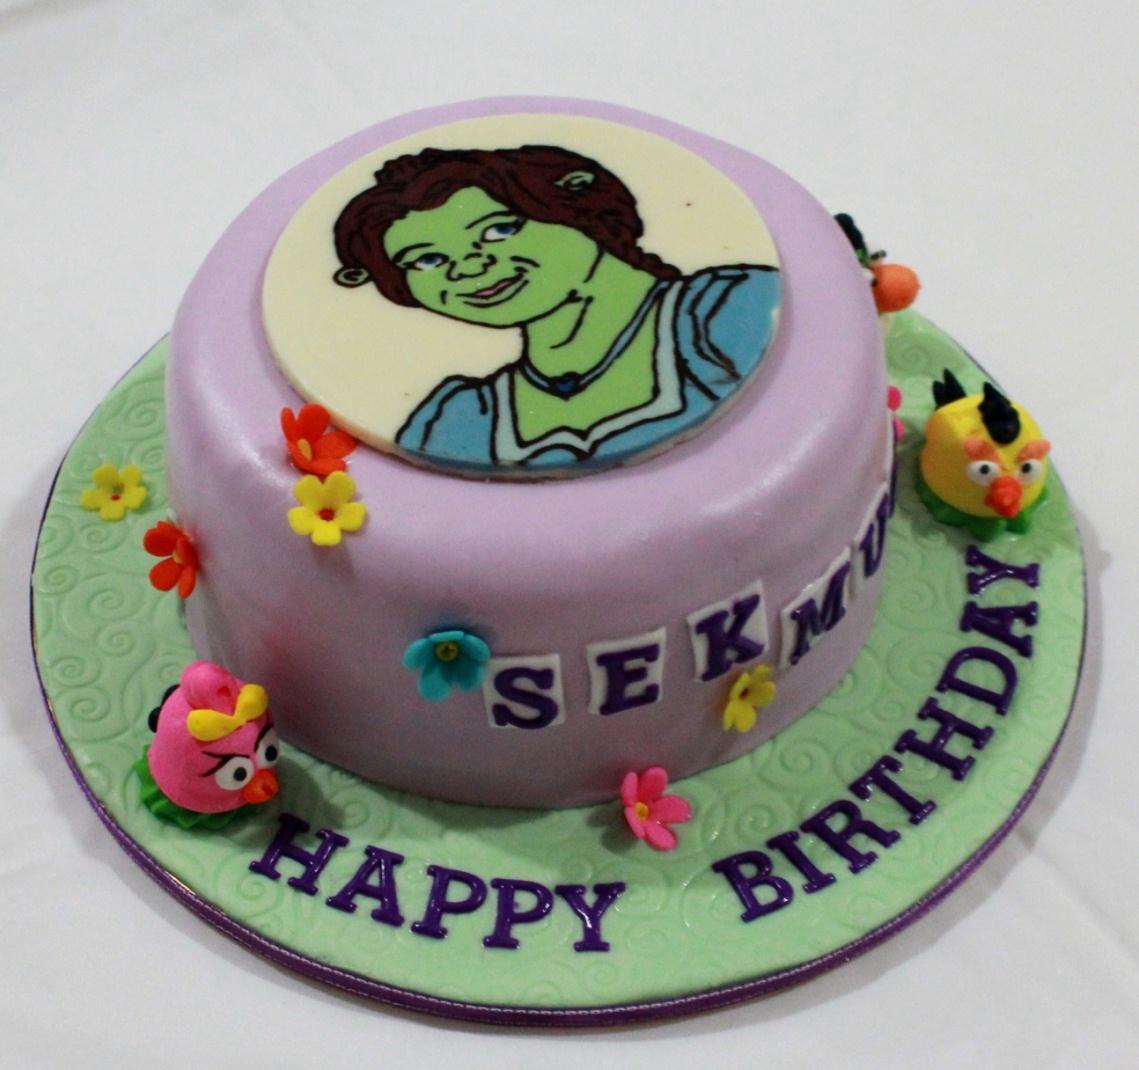 Bearylicious Cakes Princess Fiona And Angry Bird Birthday Cake